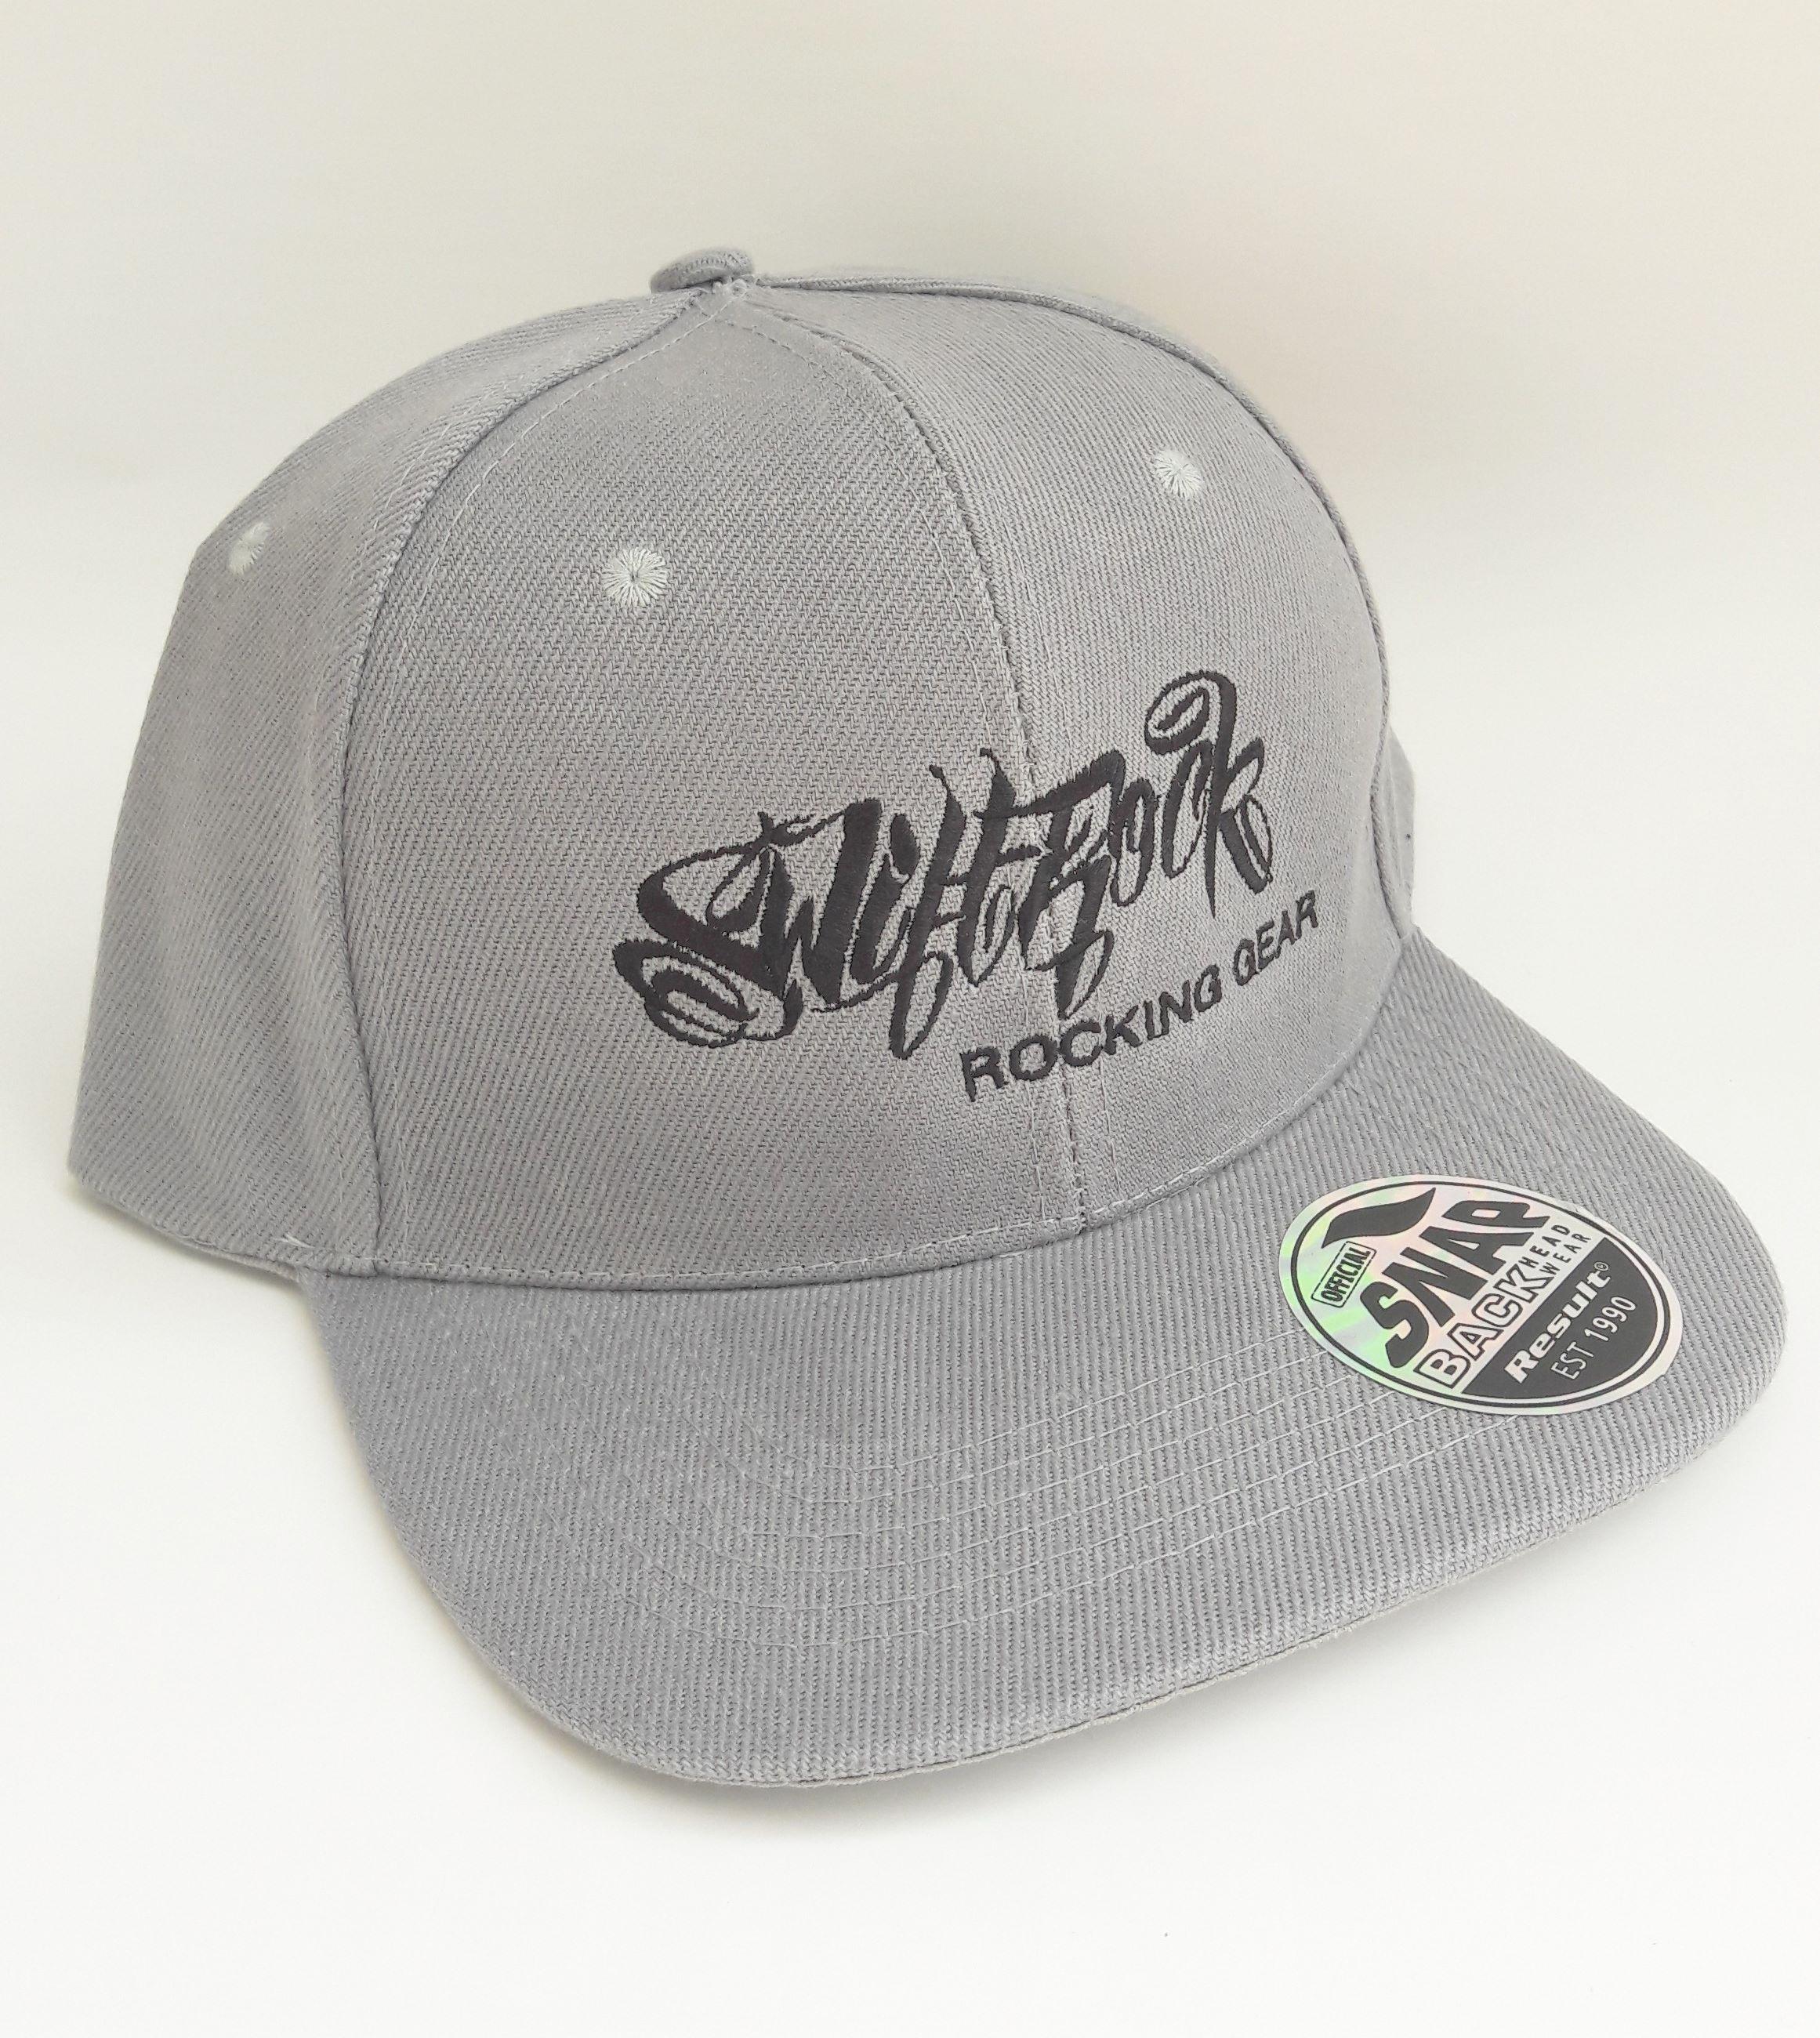 0fc84019669 Swift Rock Shop - Official Store - Rocking Gear Snapback Logo Cap Gray